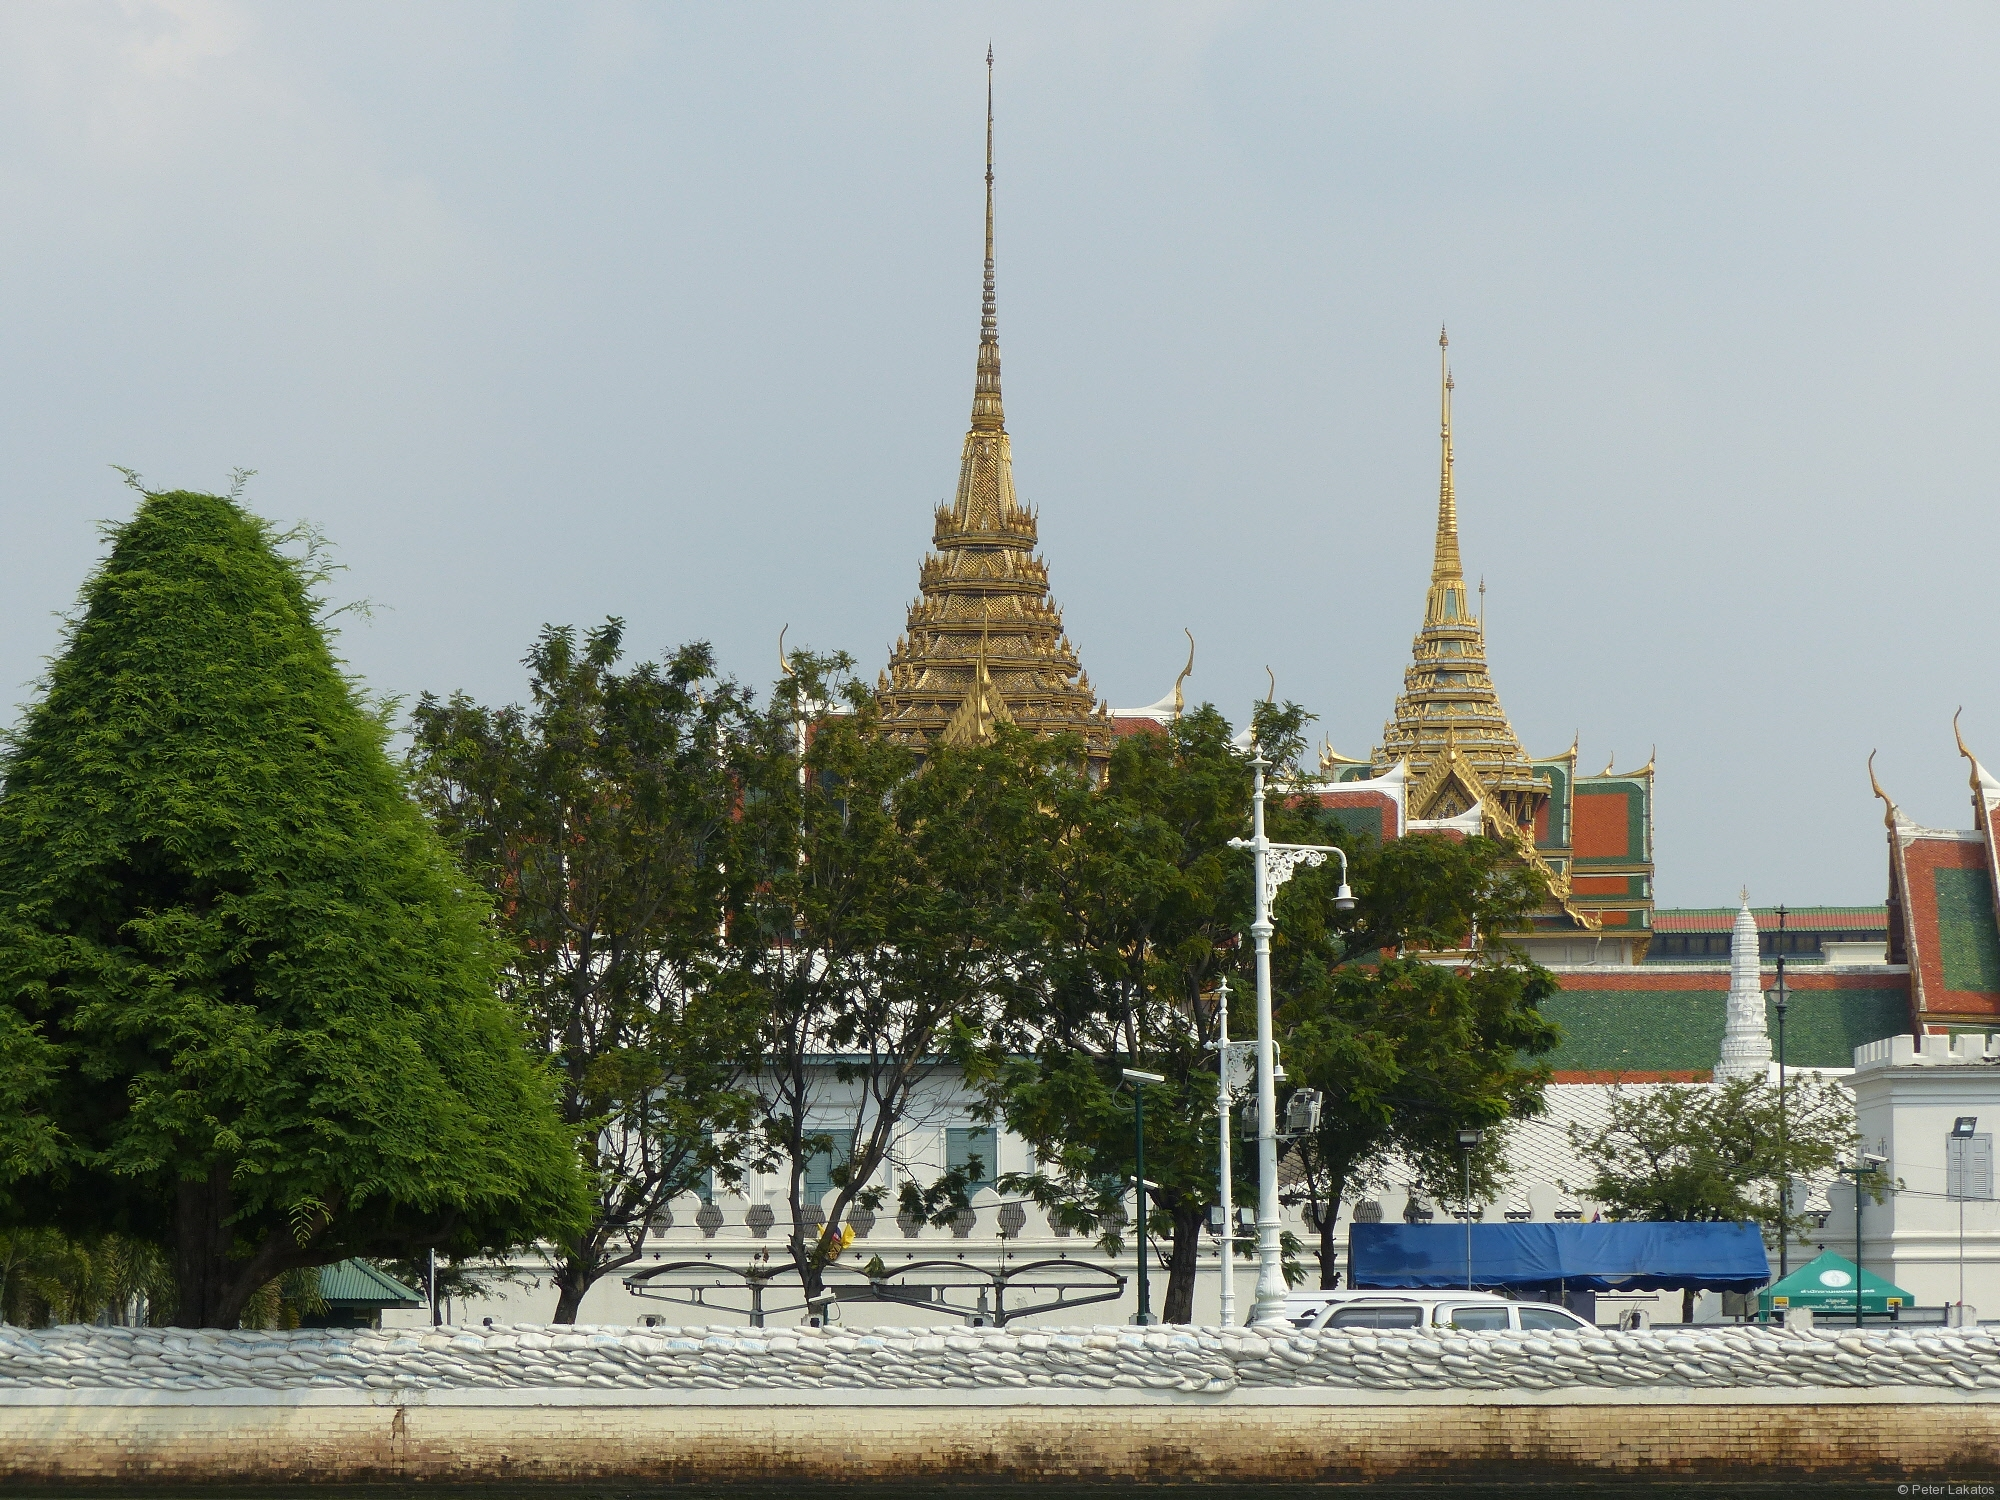 Königspalast Nah